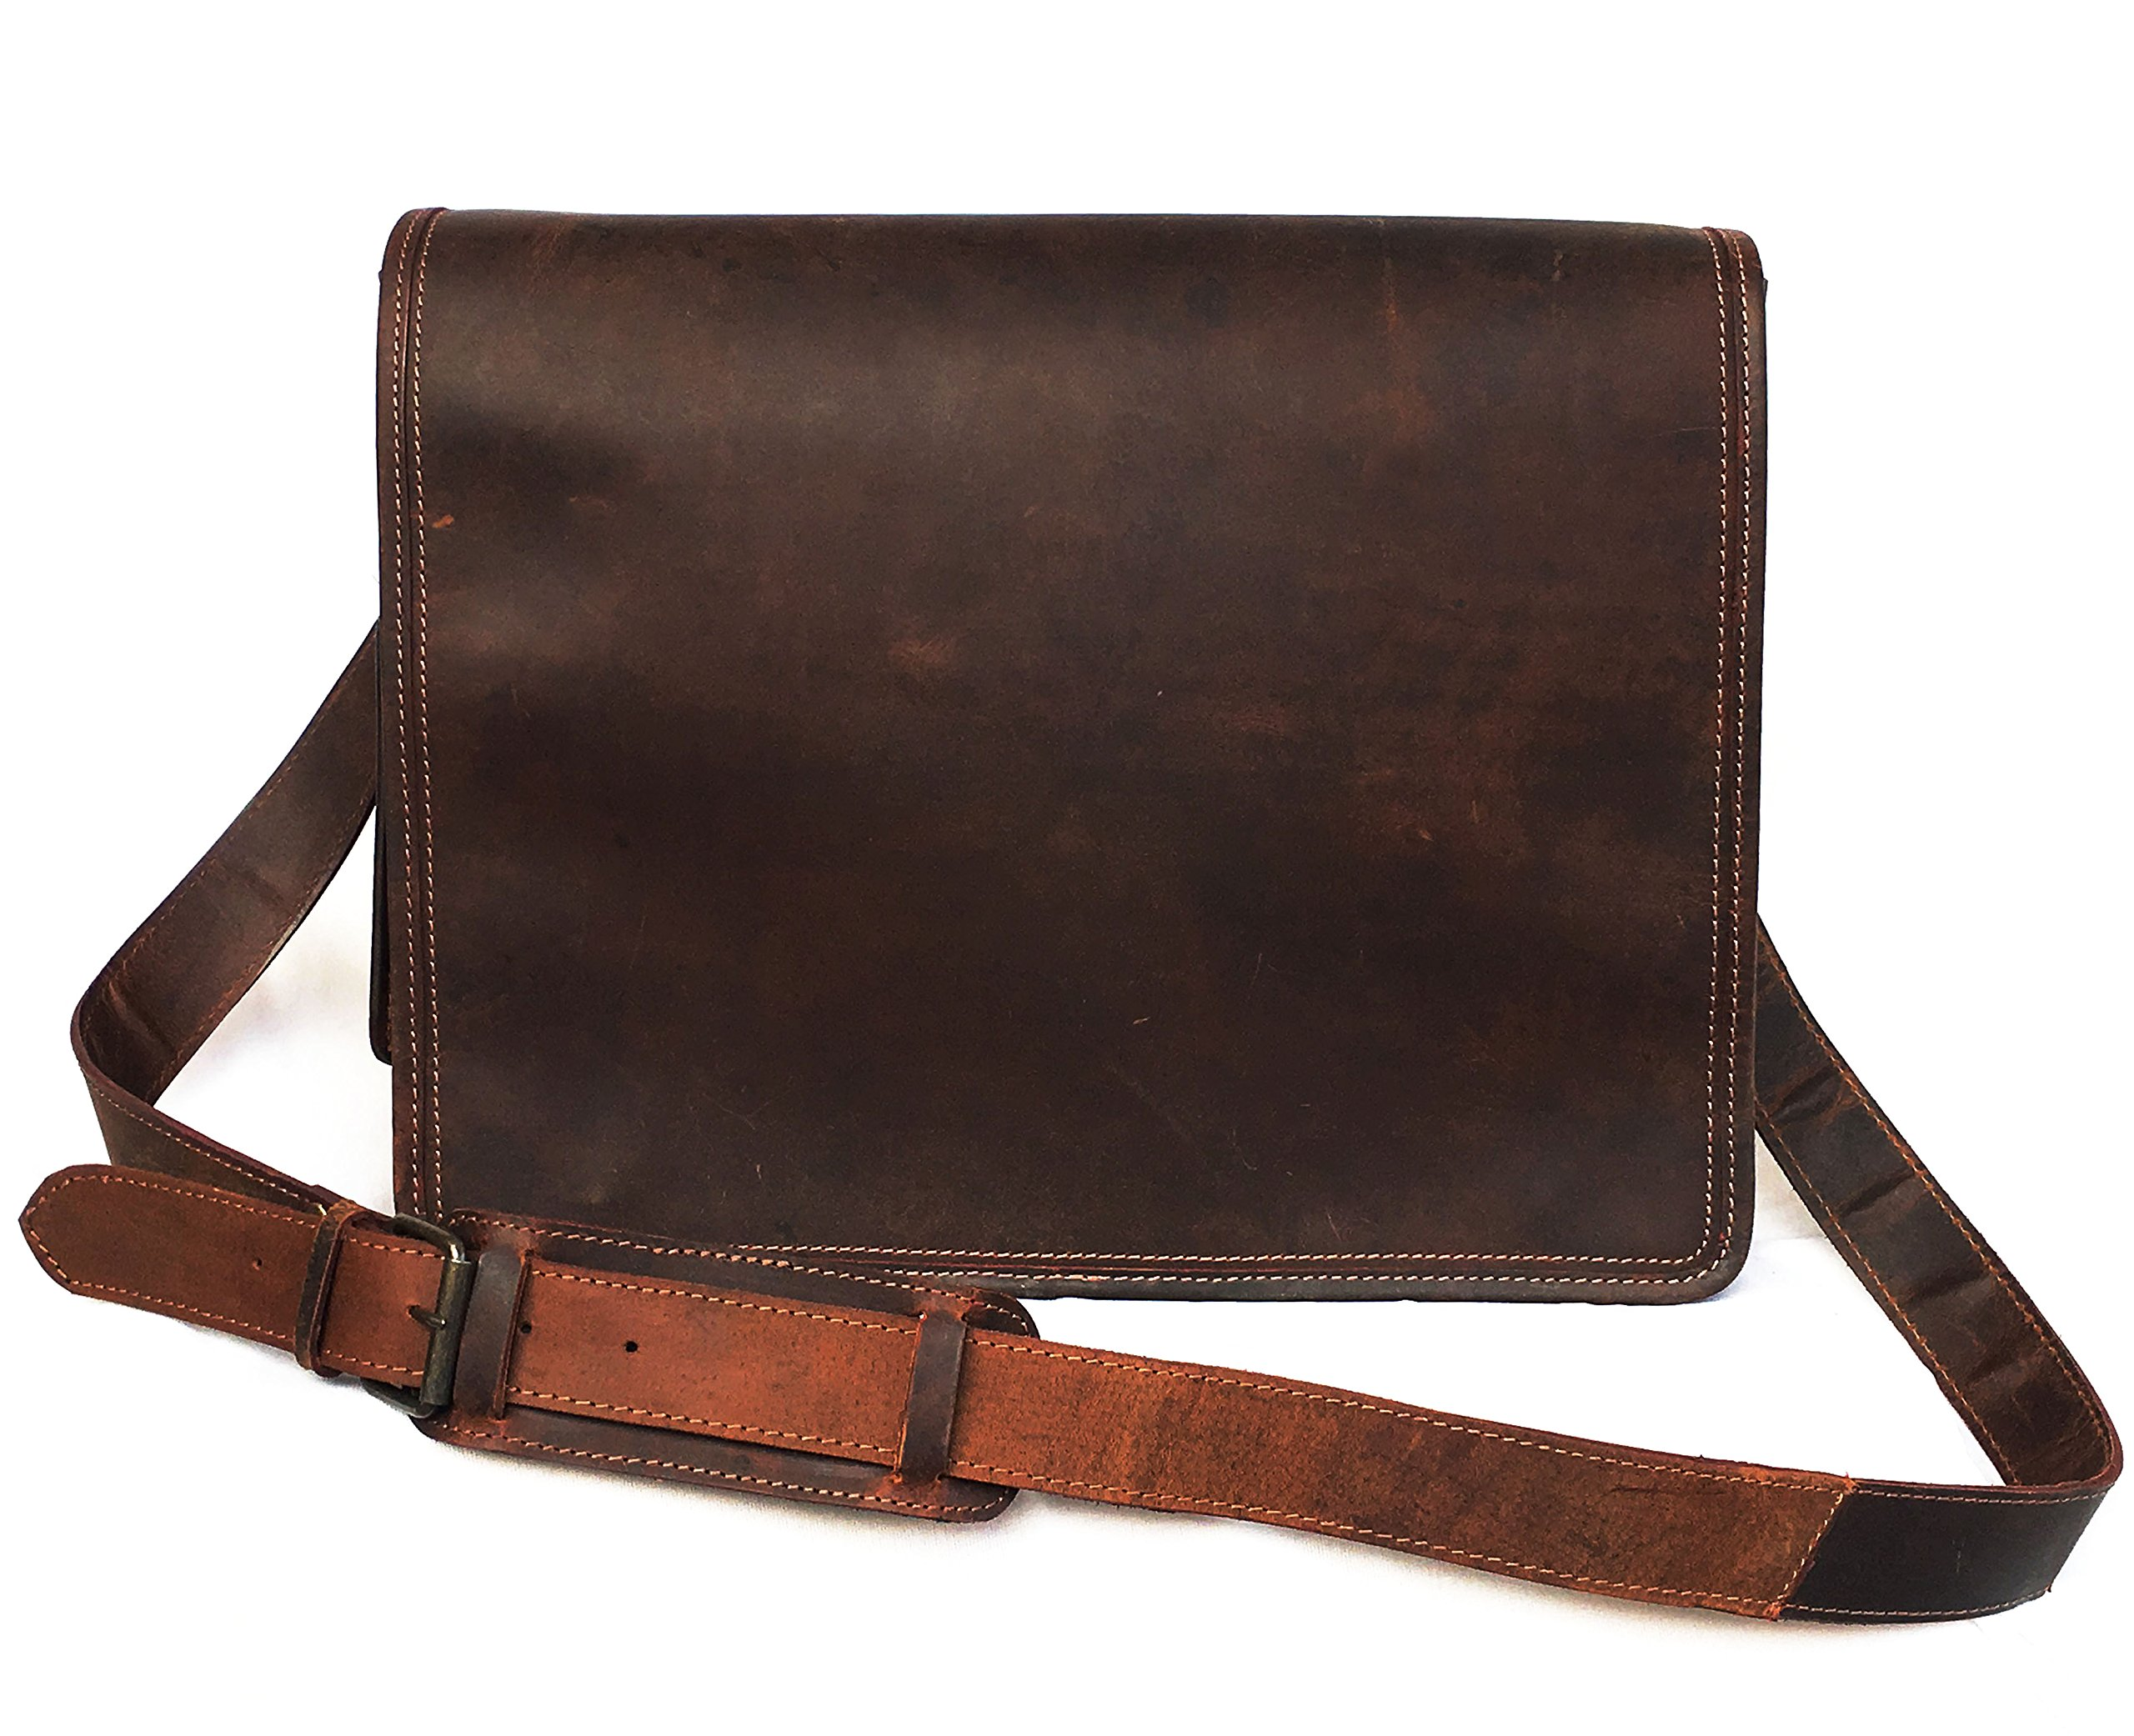 16 Inch Leather Vintage Rustic Crossbody Messenger Courier Satchel Bag Gift Men Women ~ Business Work Briefcase Carry Laptop Computer Book Handmade Rugged & Distressed By KK's Leather by kk's leather (Image #4)